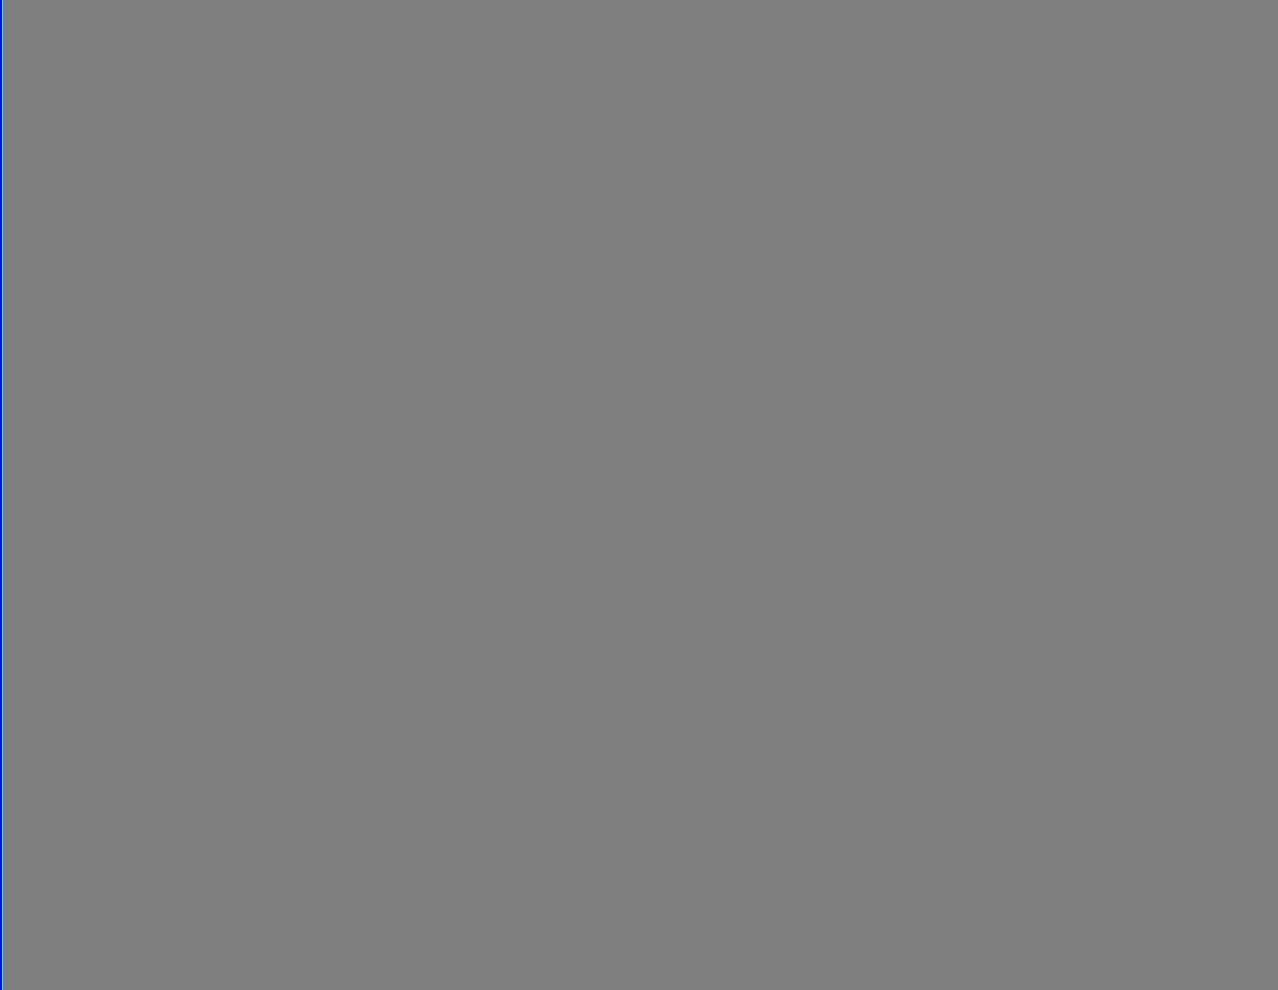 High Resolution Wallpaper | Grey 1278x990 px